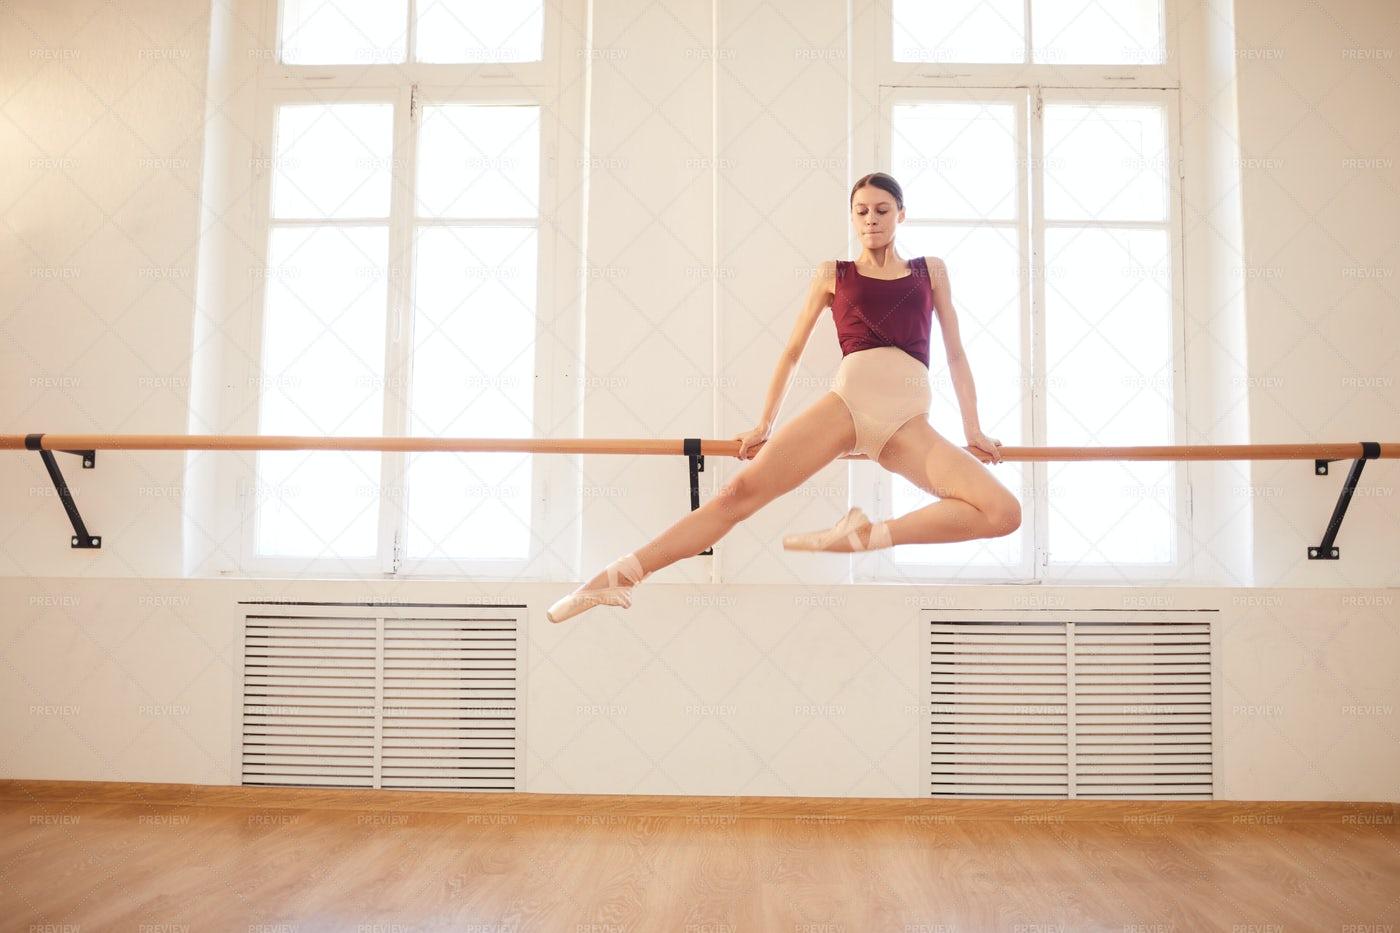 Ballerina Doing Elegant Pull-up On...: Stock Photos